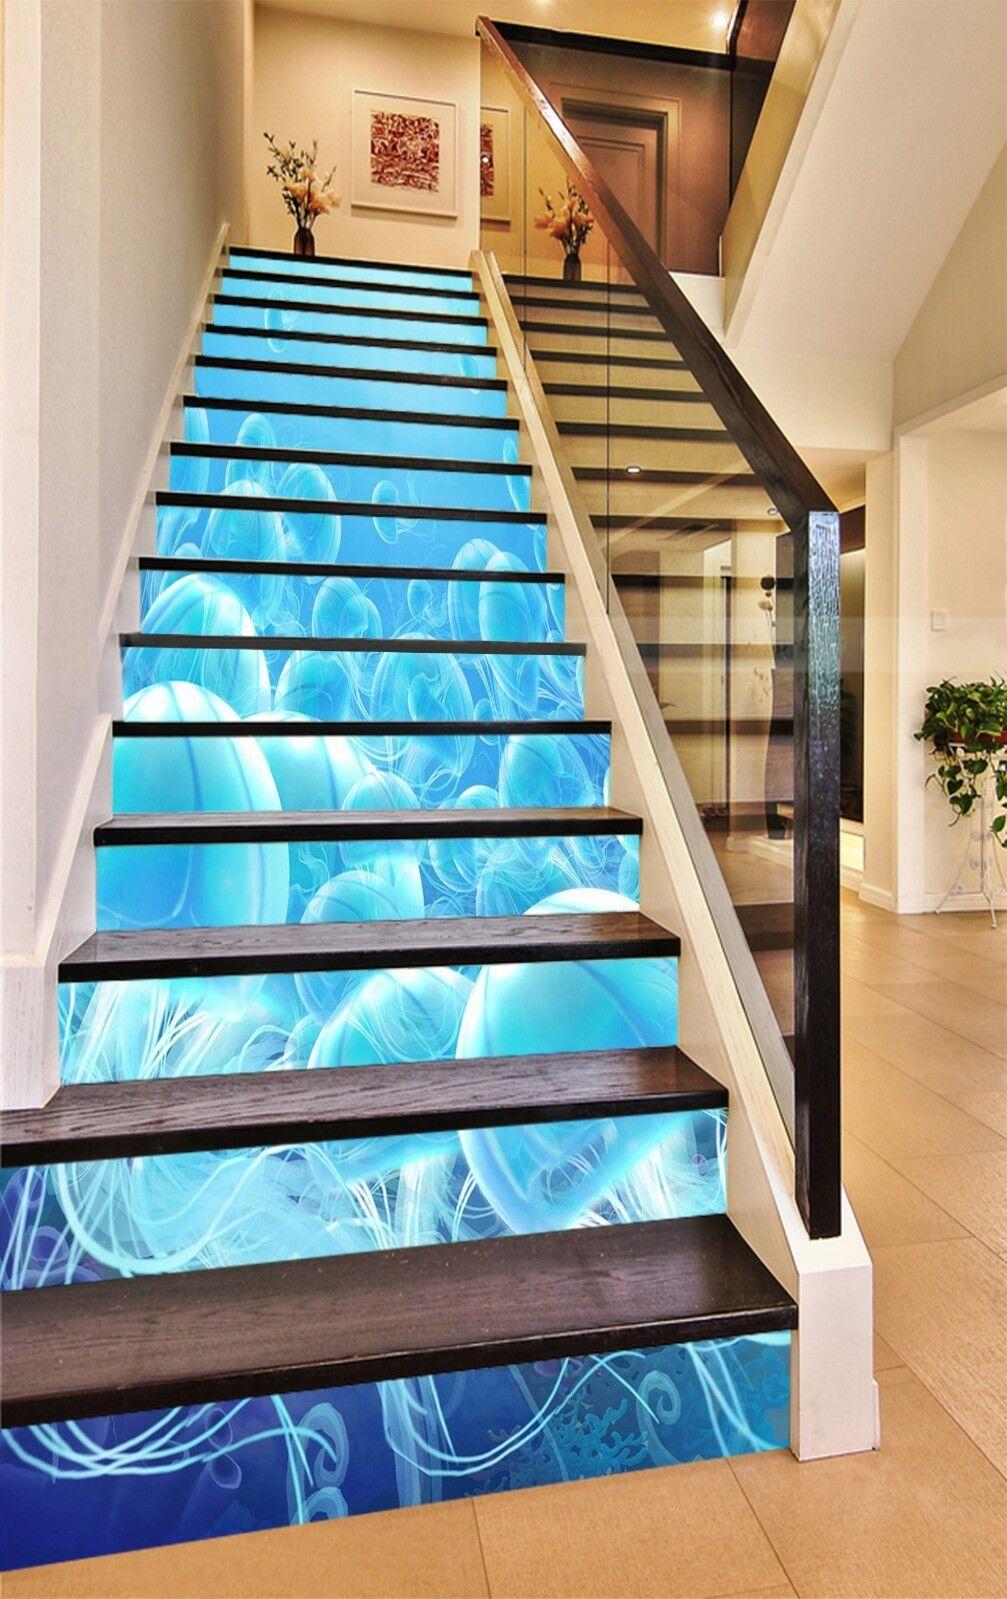 3D Bubble Bule Stair Risers Decoration Photo Mural Vinyl Decal Wallpaper CA